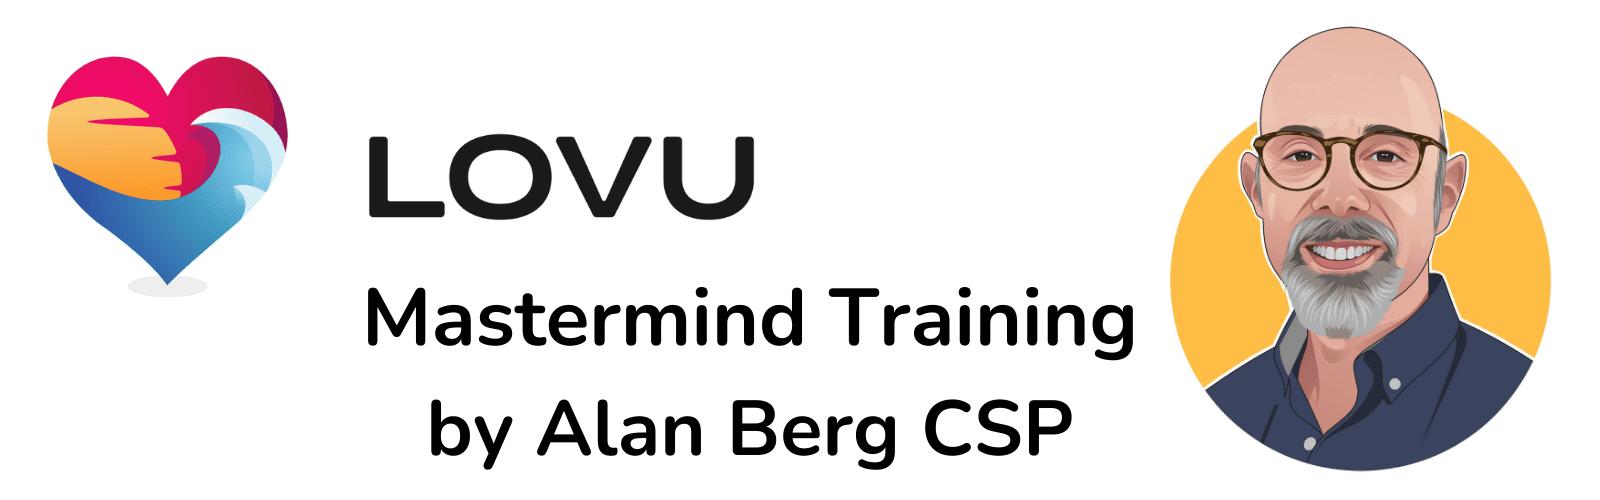 LOVU Mastermind Training by Alan Berg CSP